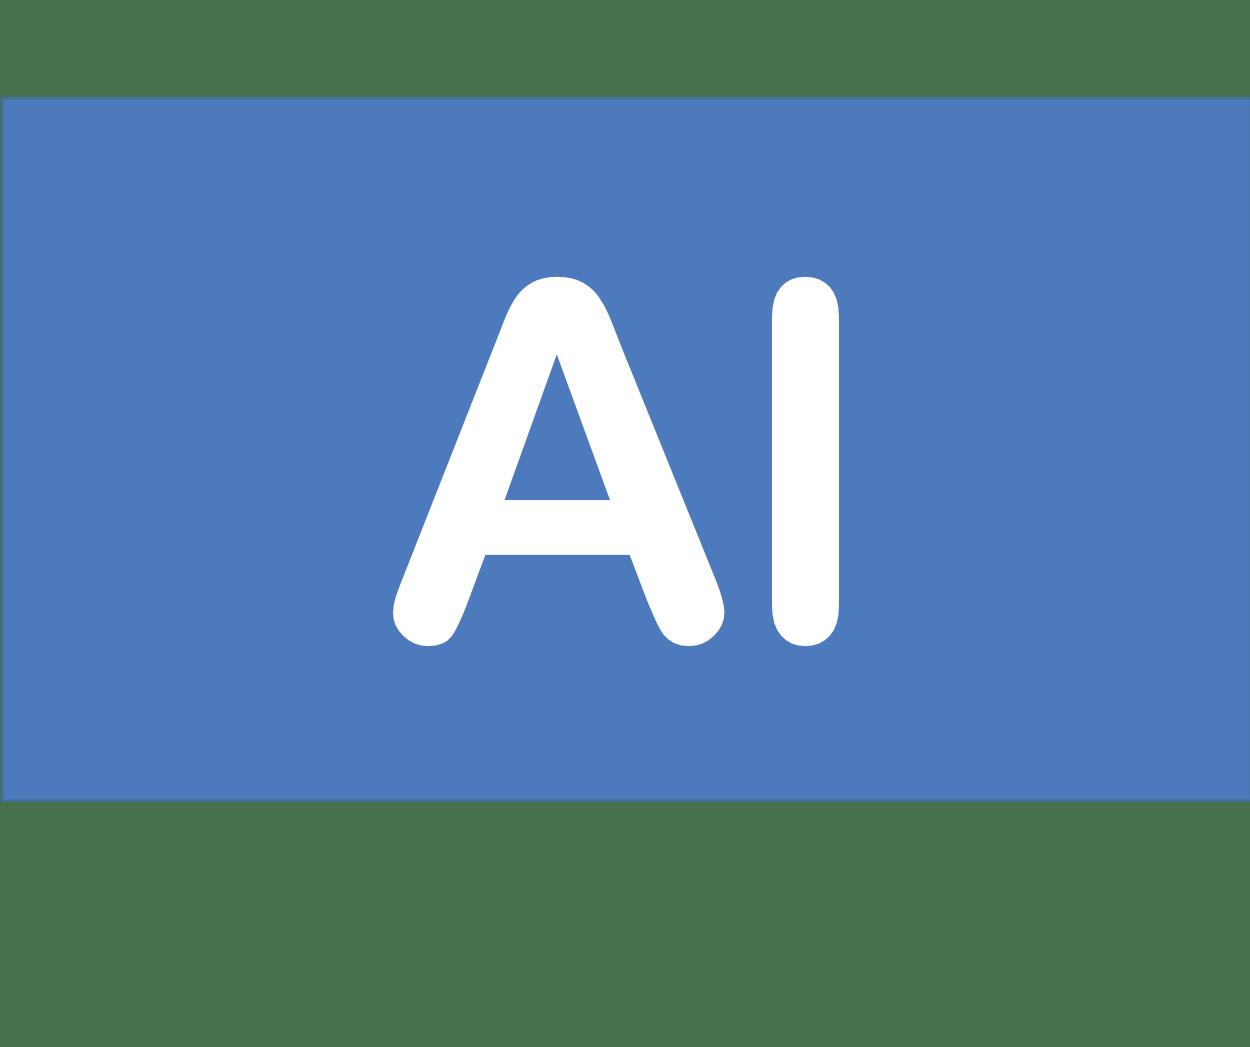 13 Al アルミニウム Aluminium 元素 記号 周期表 化学 原子